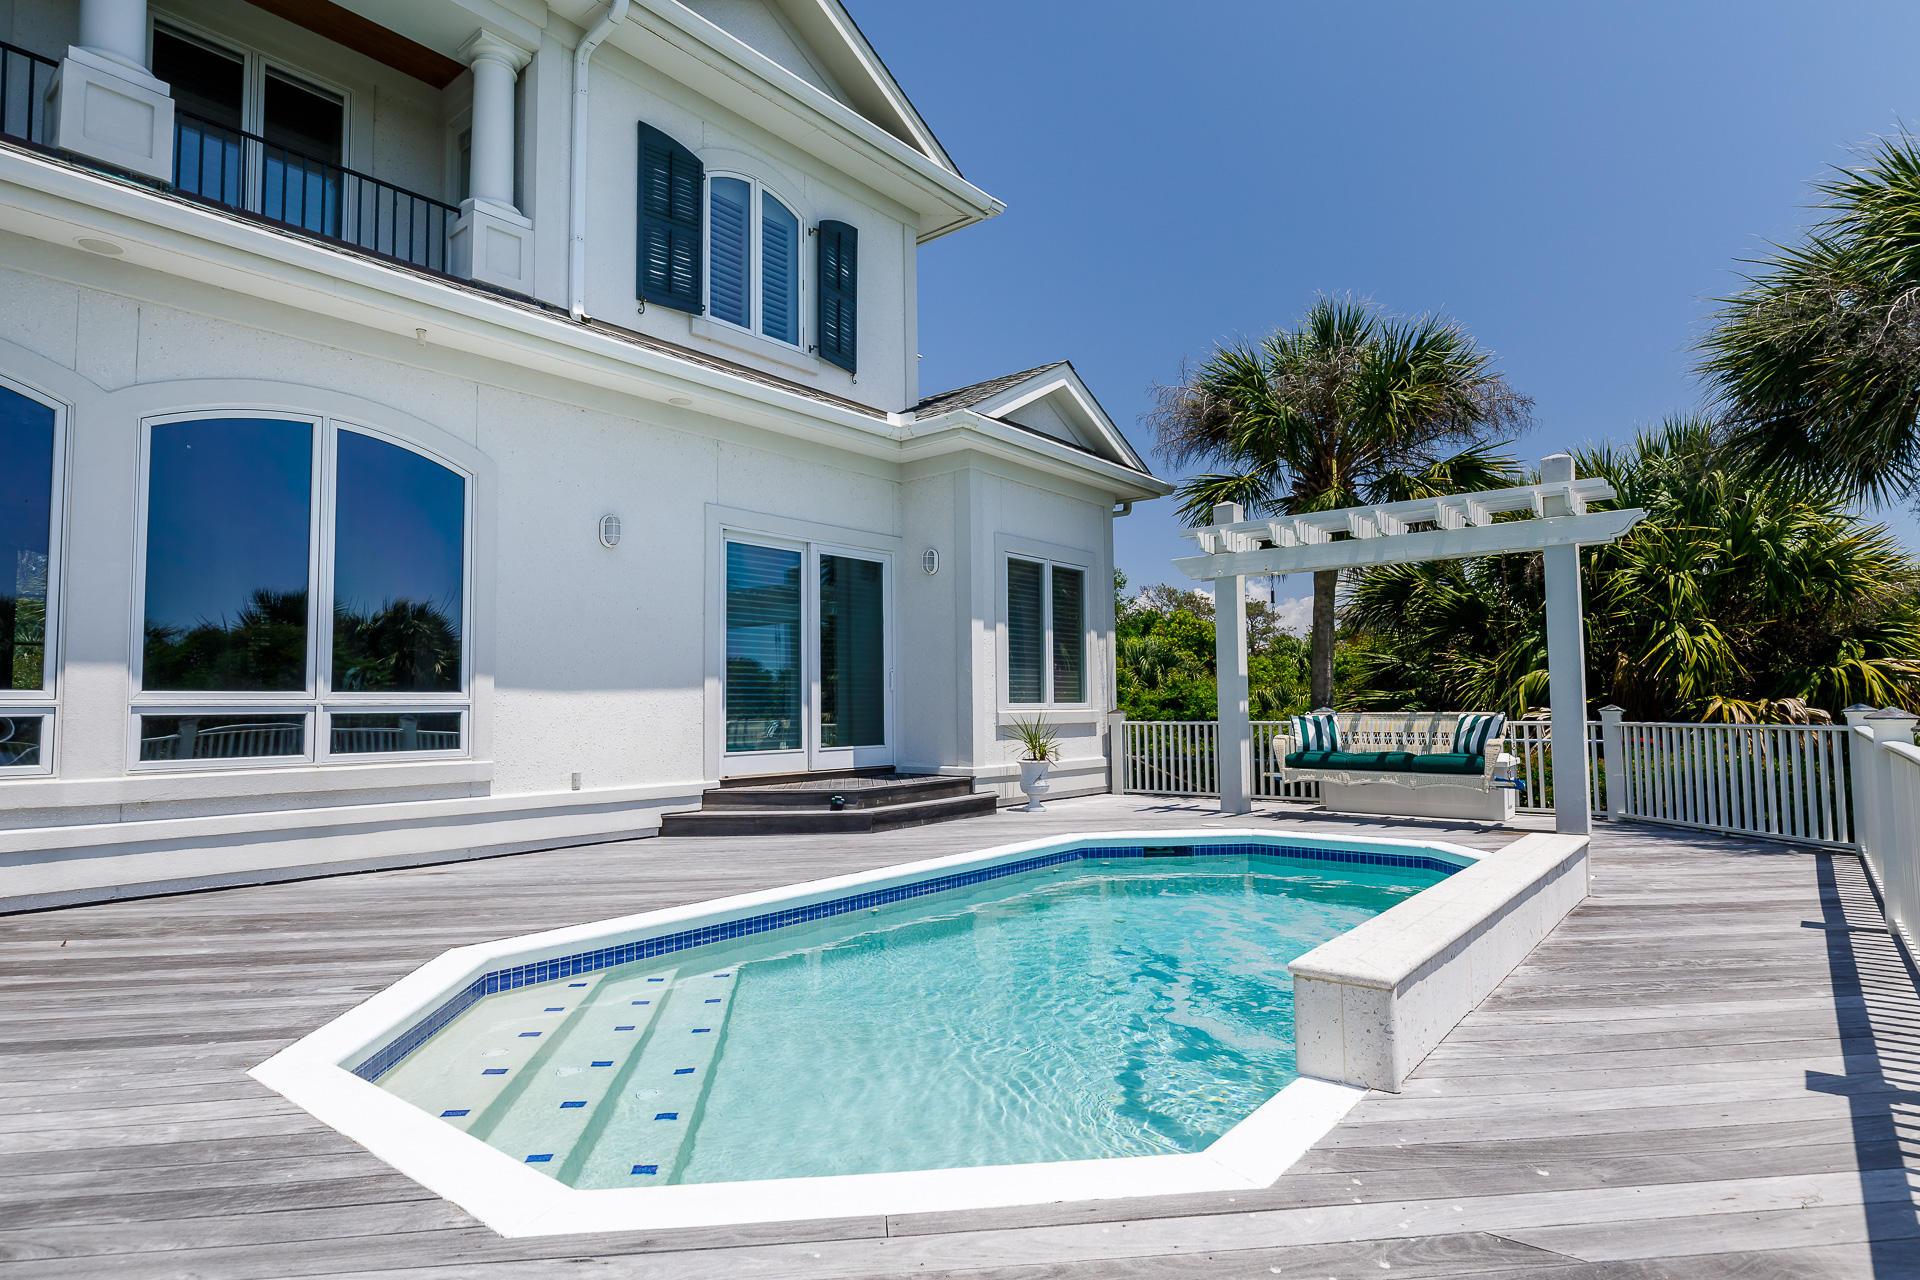 Seabrook Island Homes For Sale - 2216 Rolling Dune, Seabrook Island, SC - 46